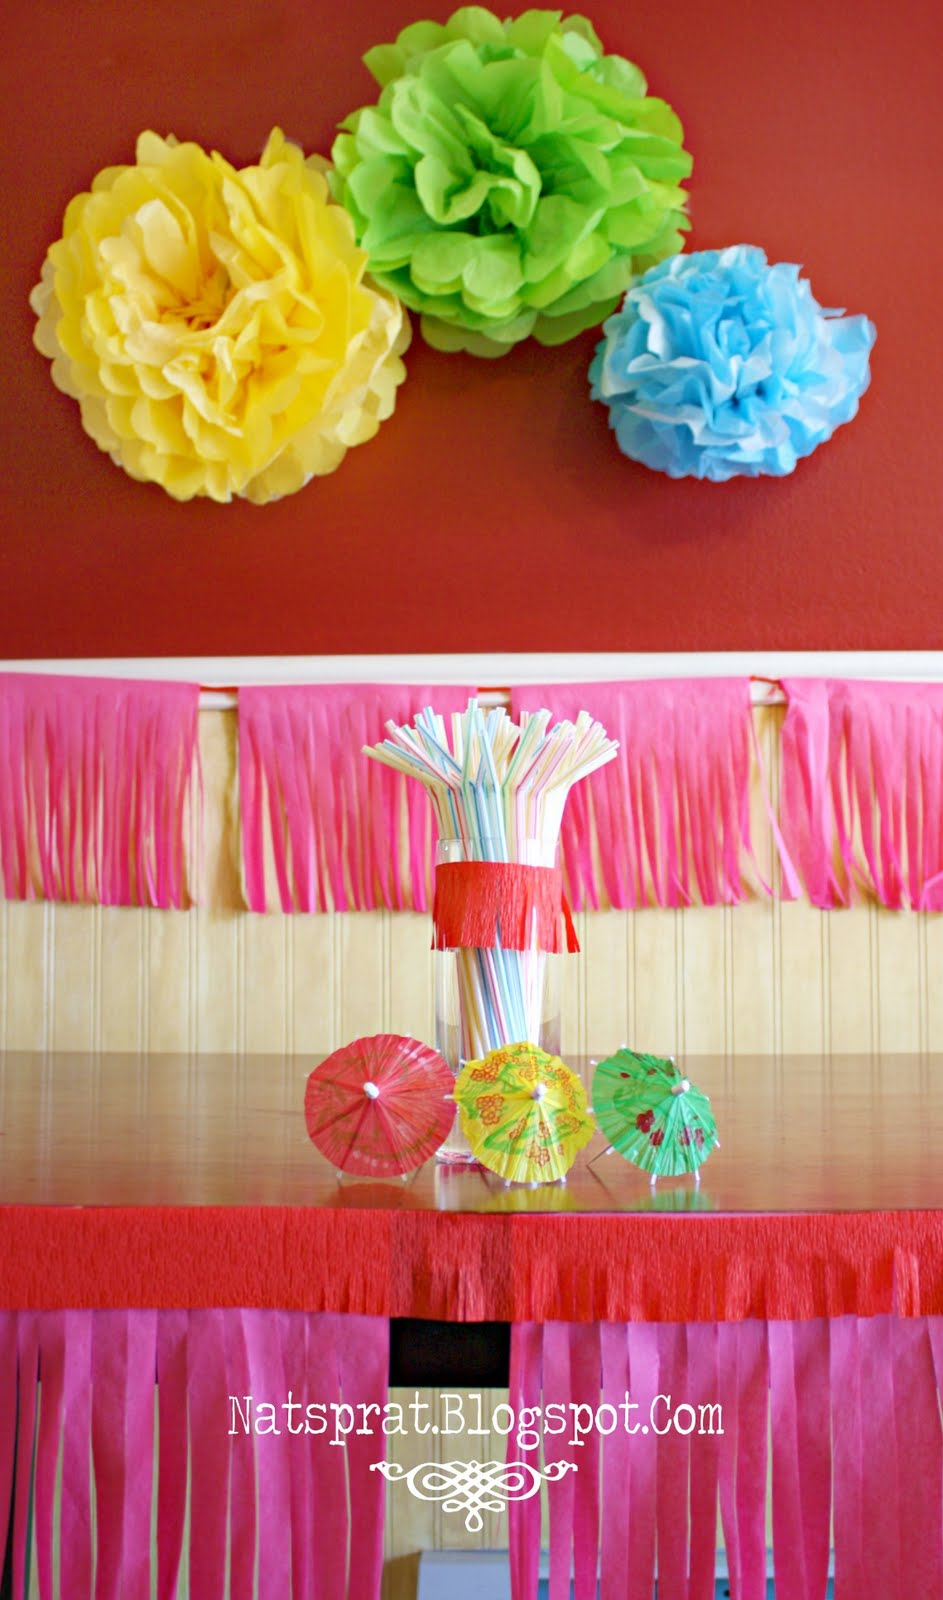 Natsprat Tissue Paper Party Decorations Tutorial